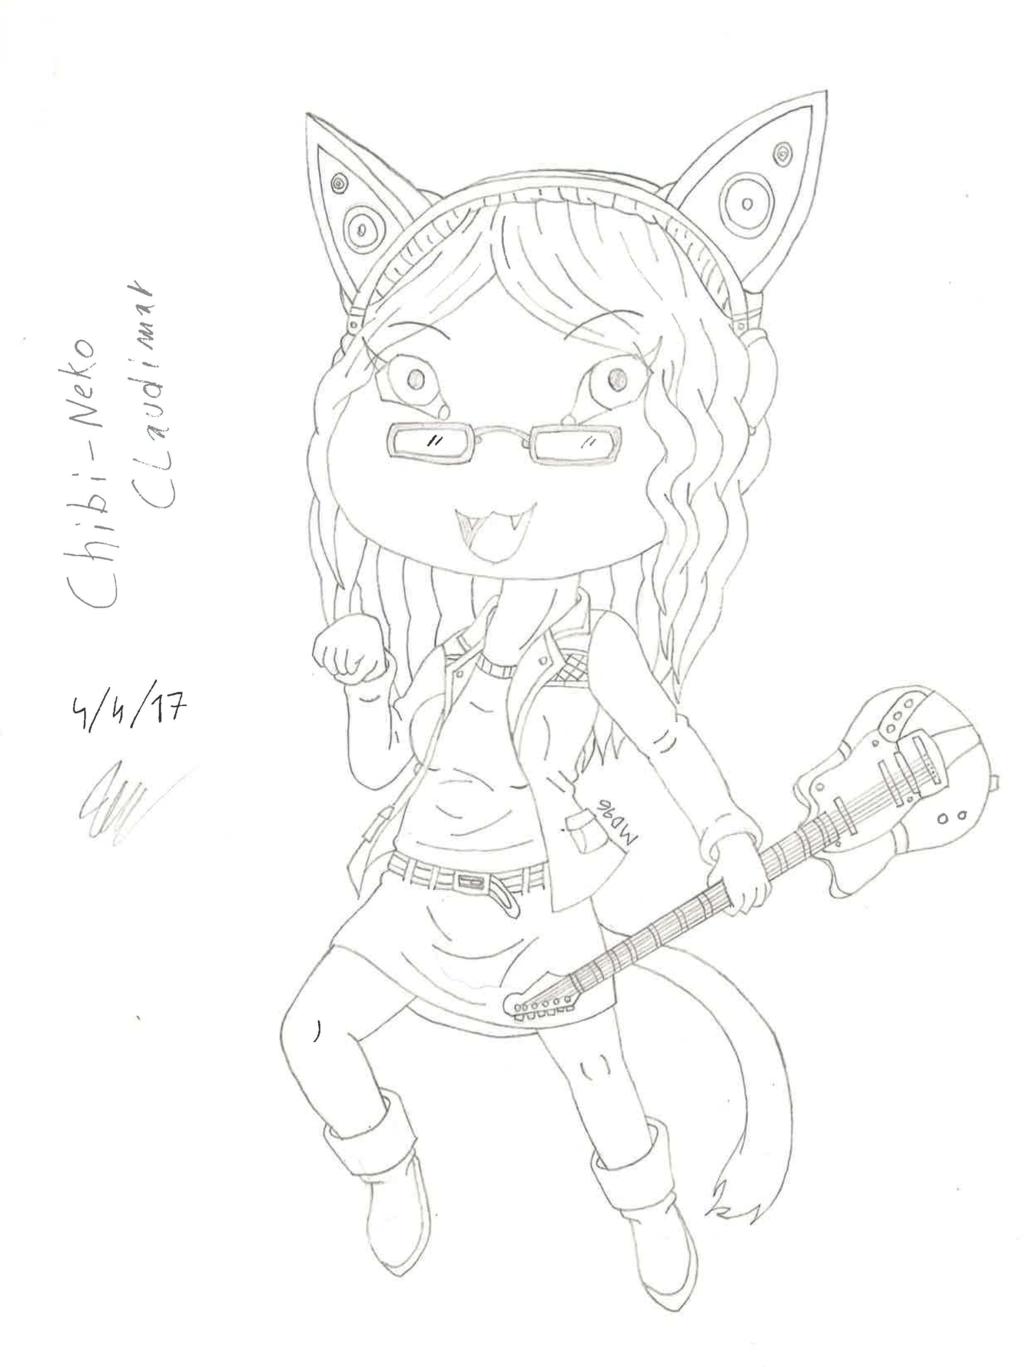 Chibi Emma (Claudimar) - Original sketch